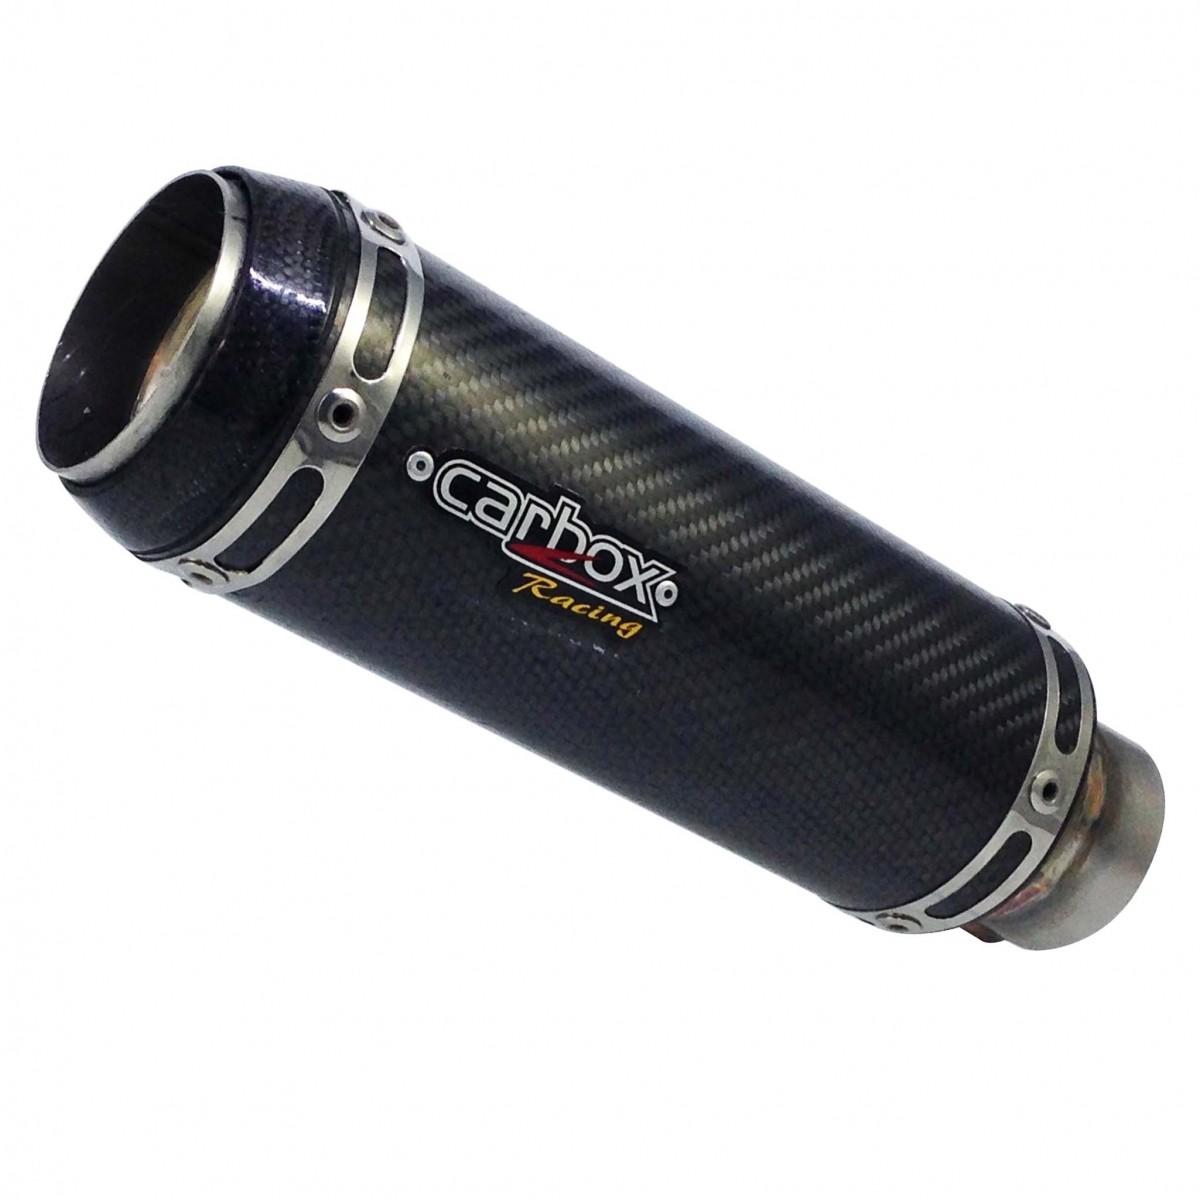 Ponteira Esportiva GP Tech Carbon p/ Suzuki GSR 750